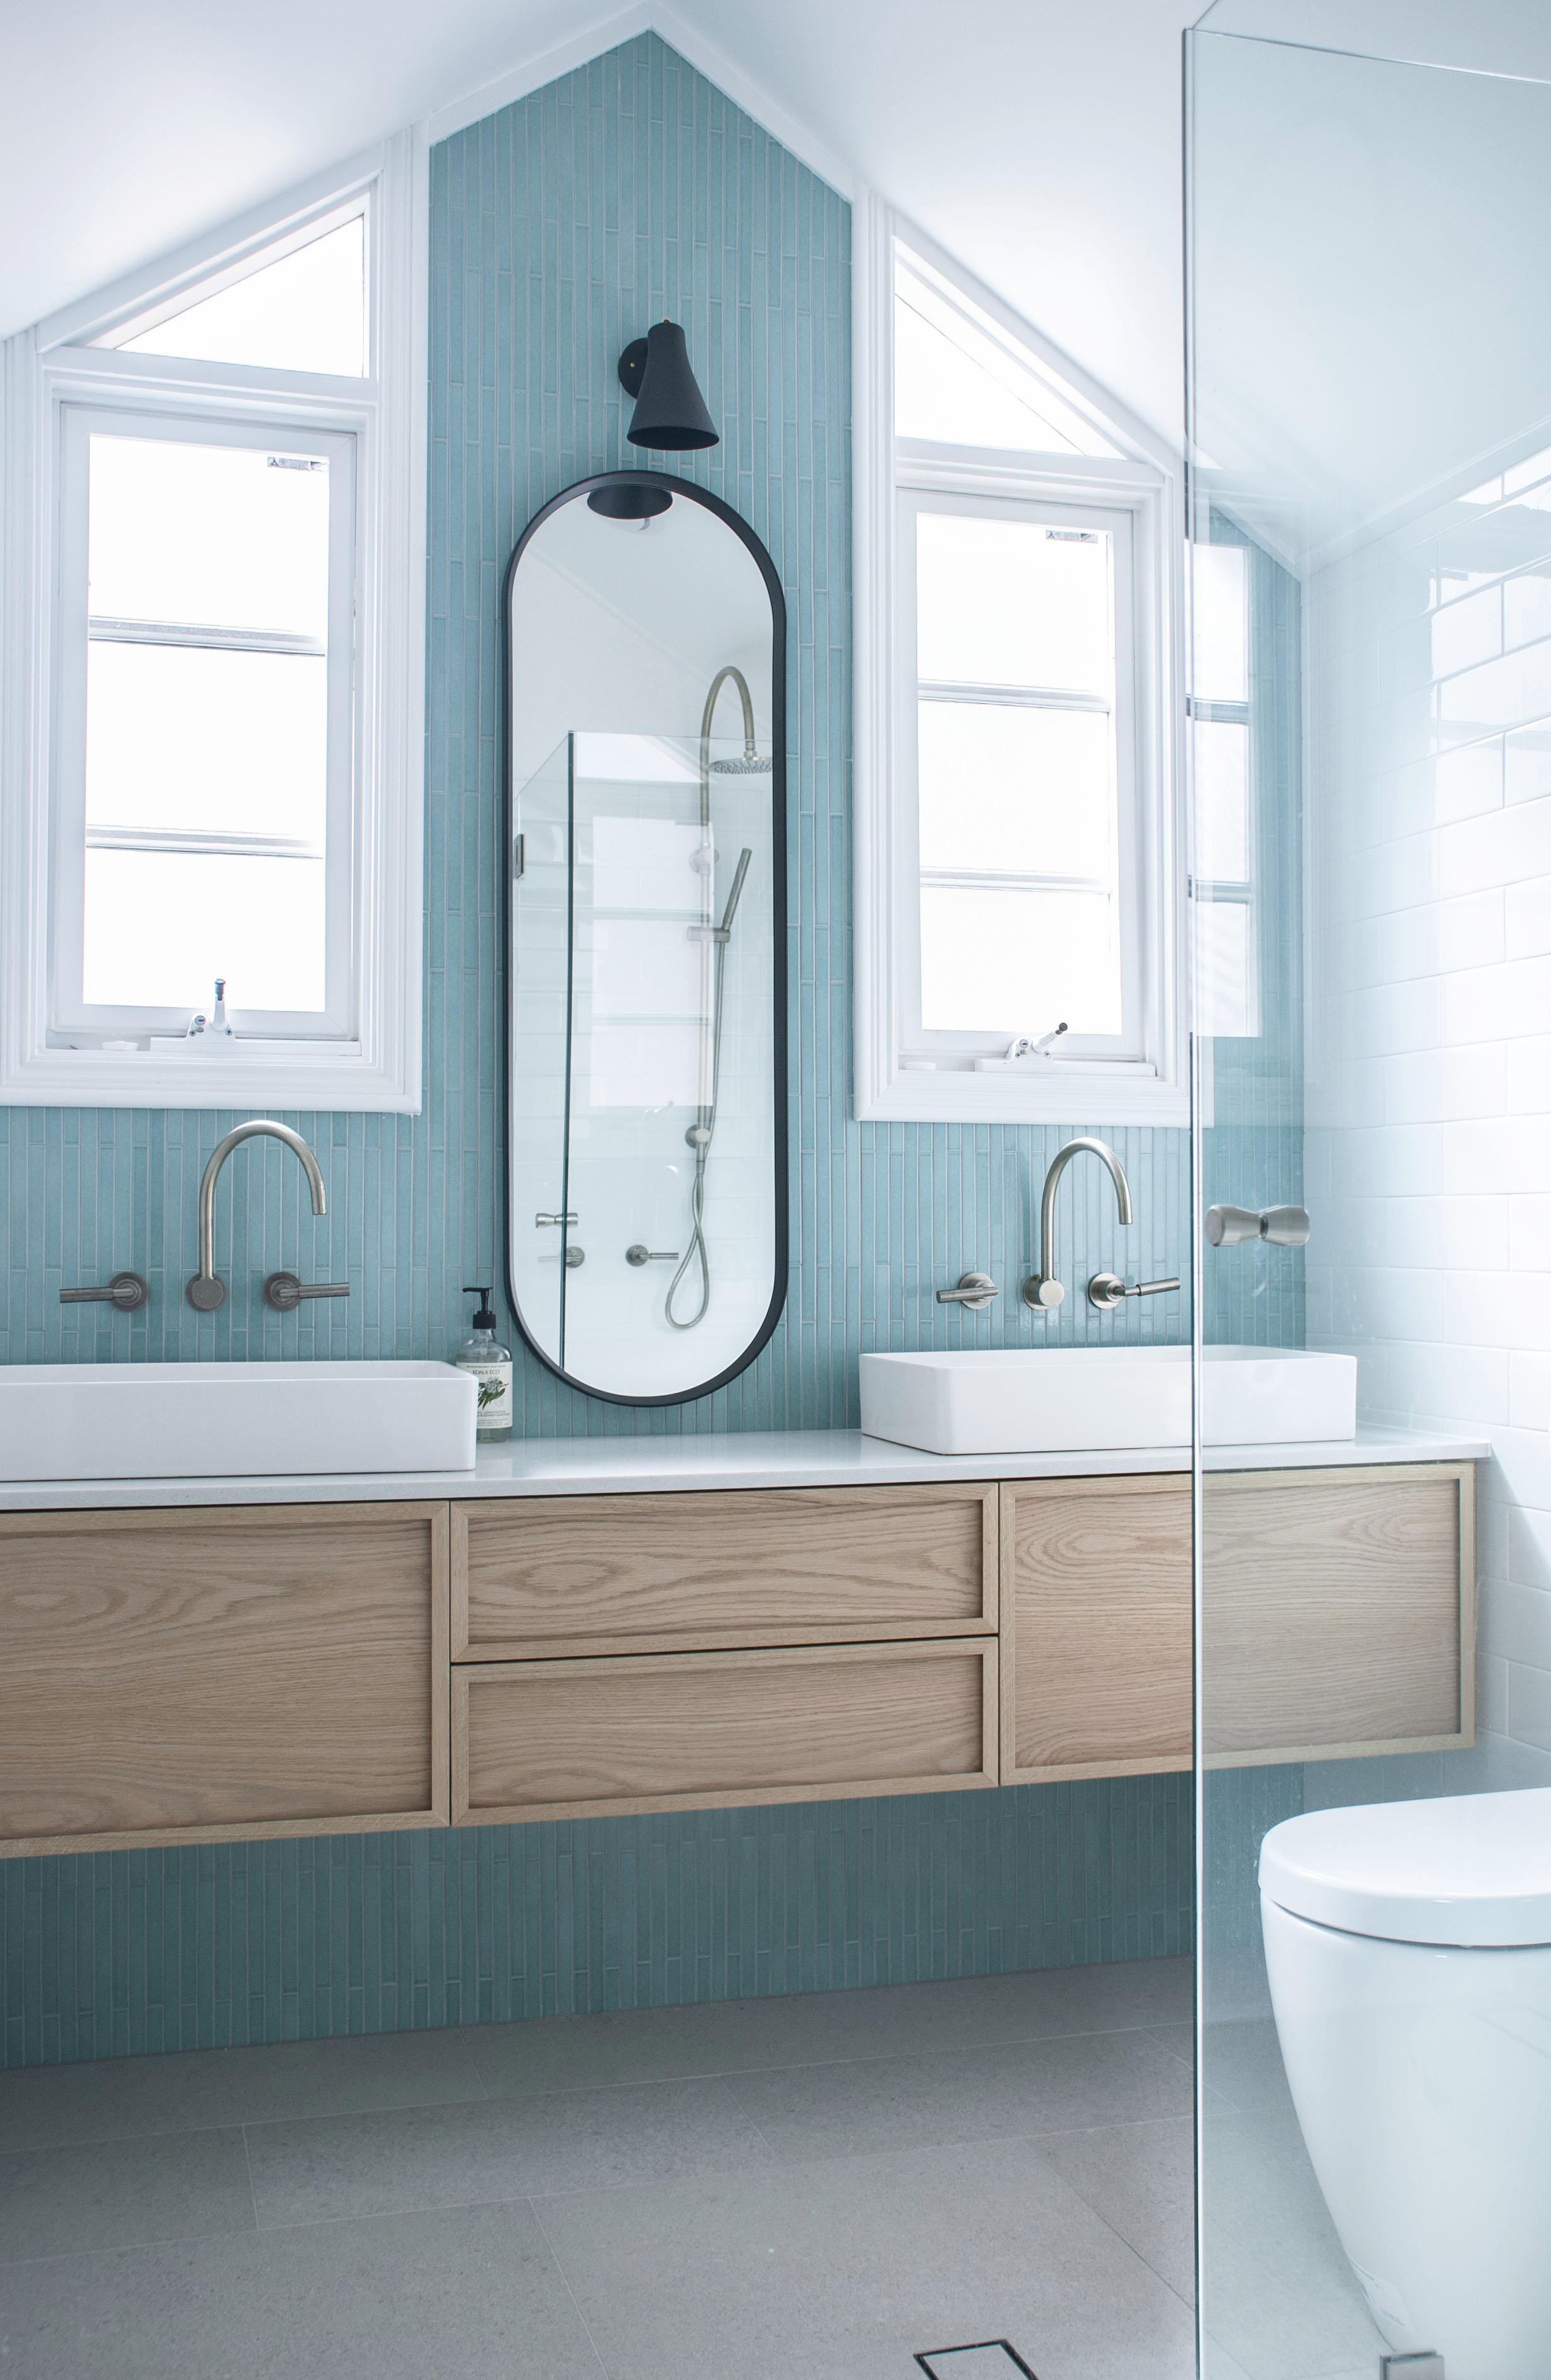 Turner Interior Design - Shower room 2.jpg